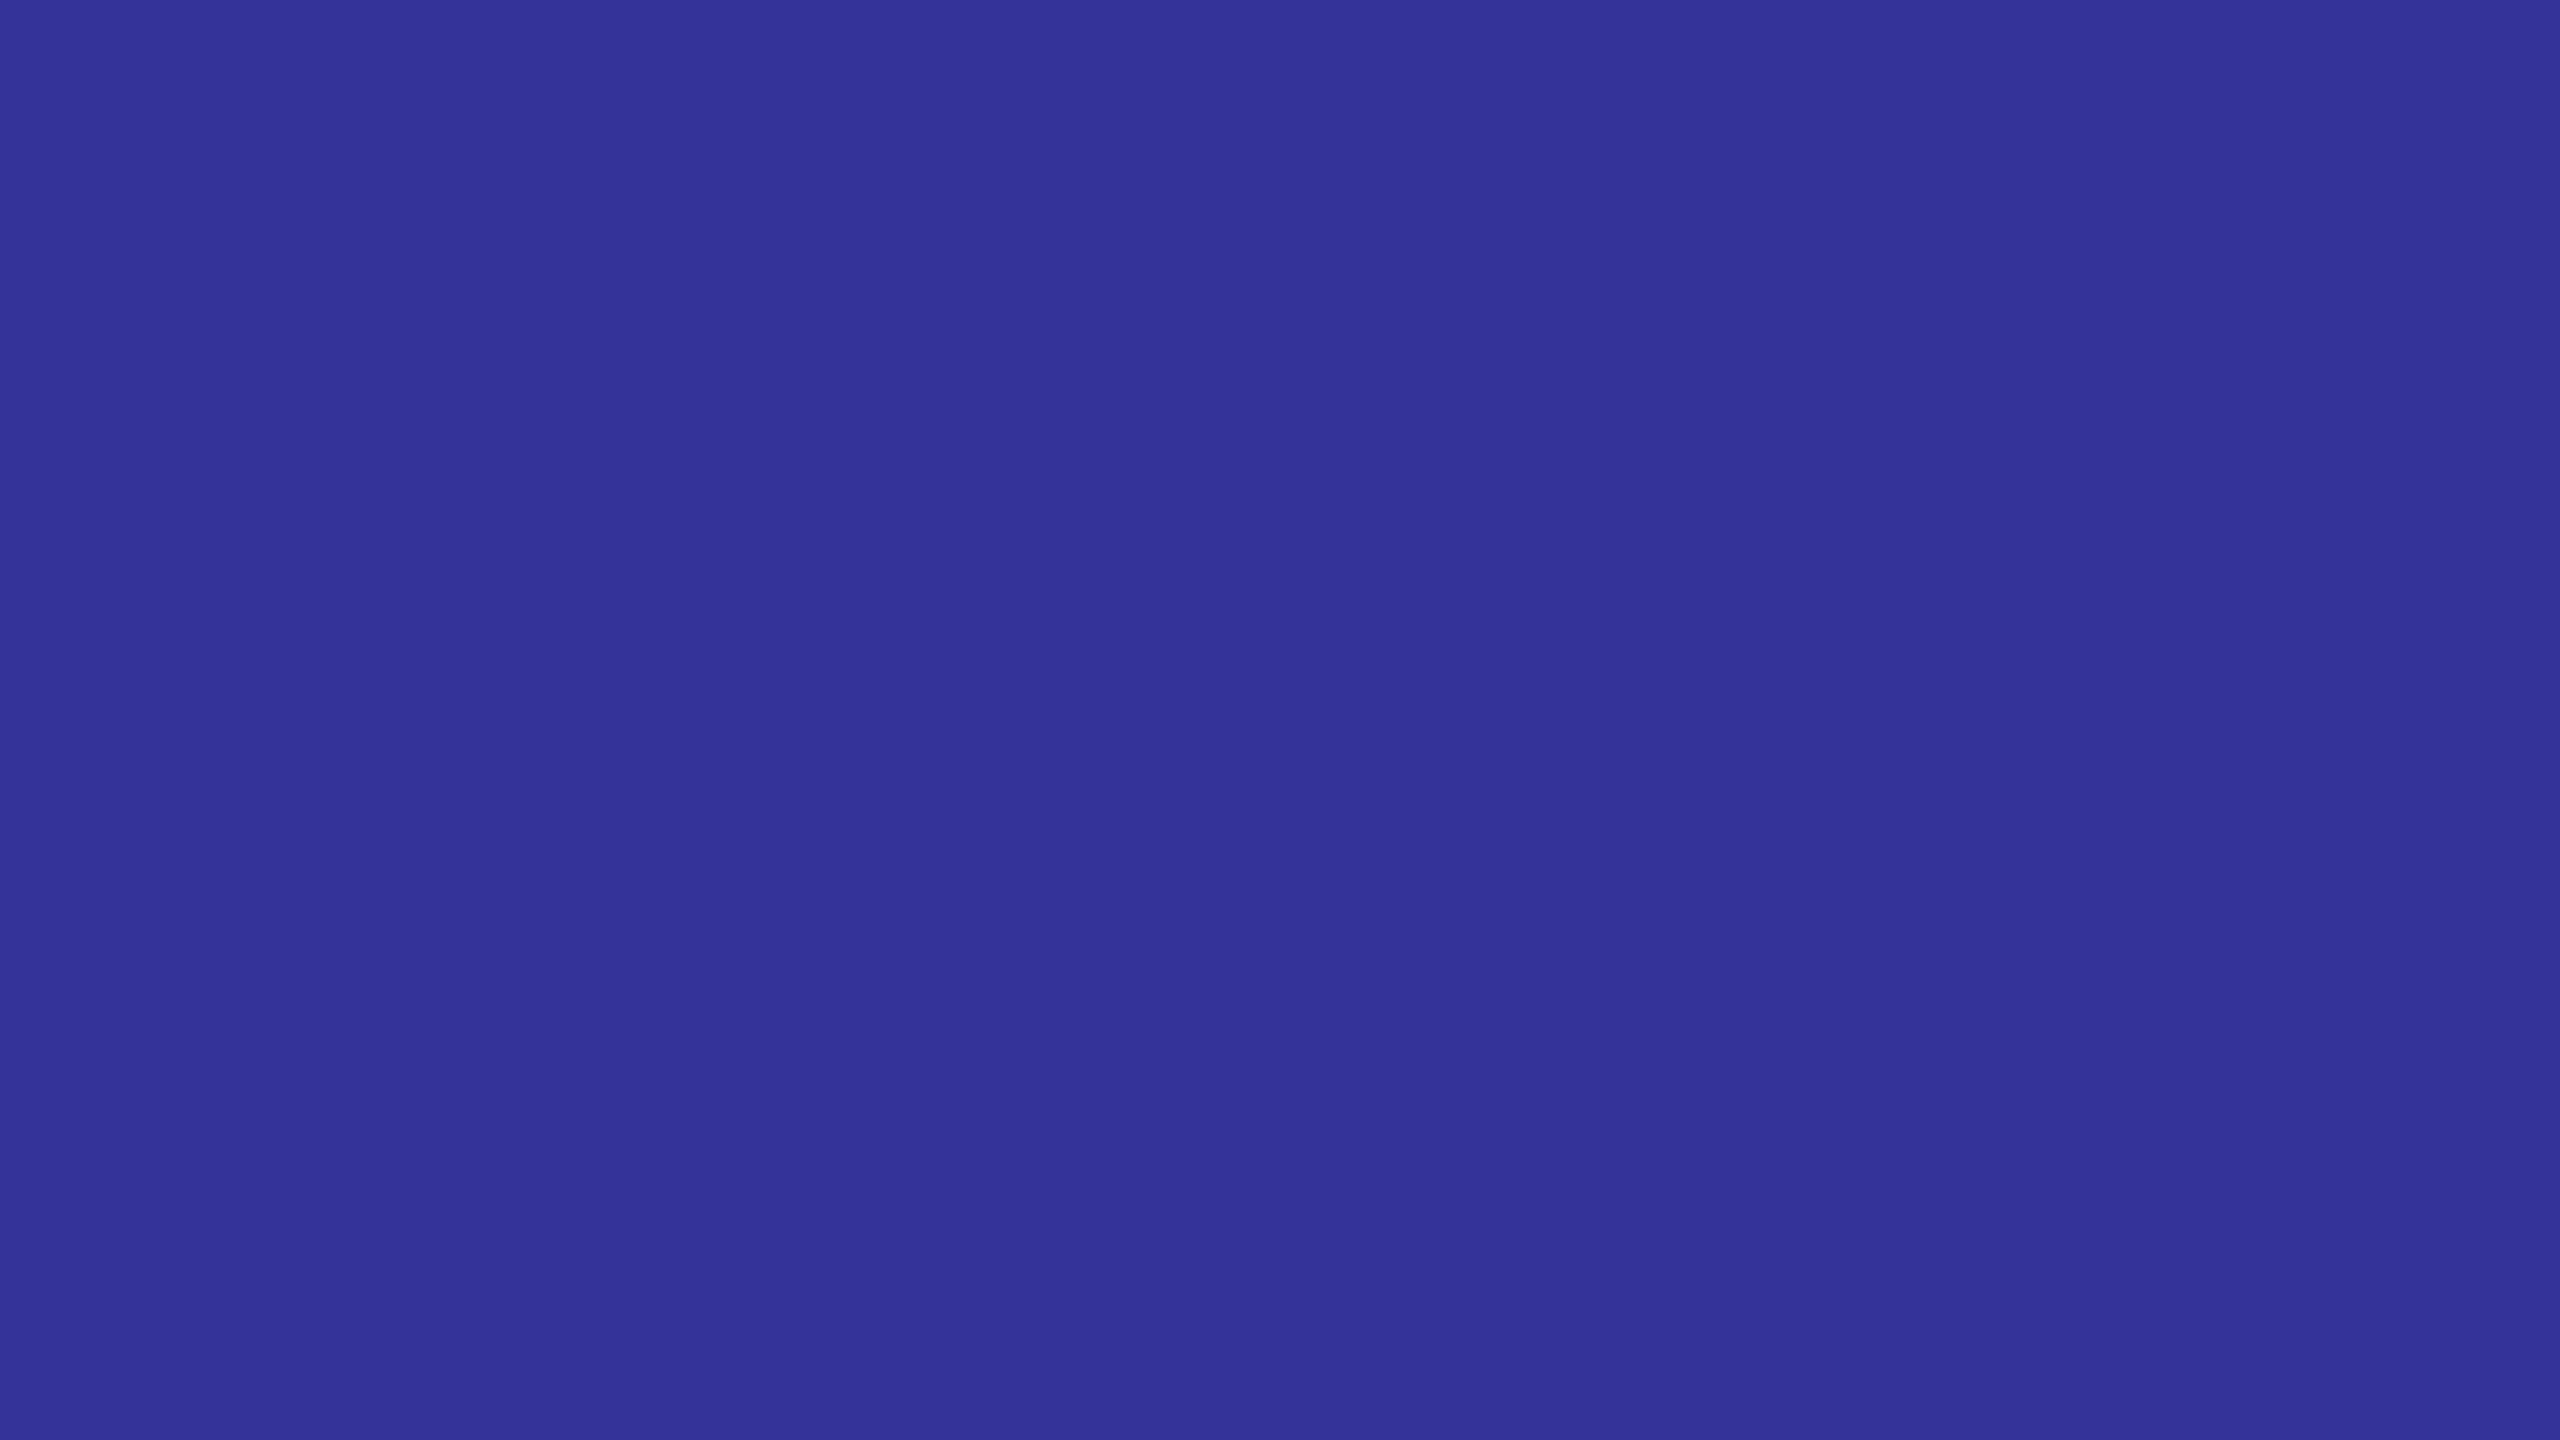 2560x1440 Blue Pigment Solid Color Background